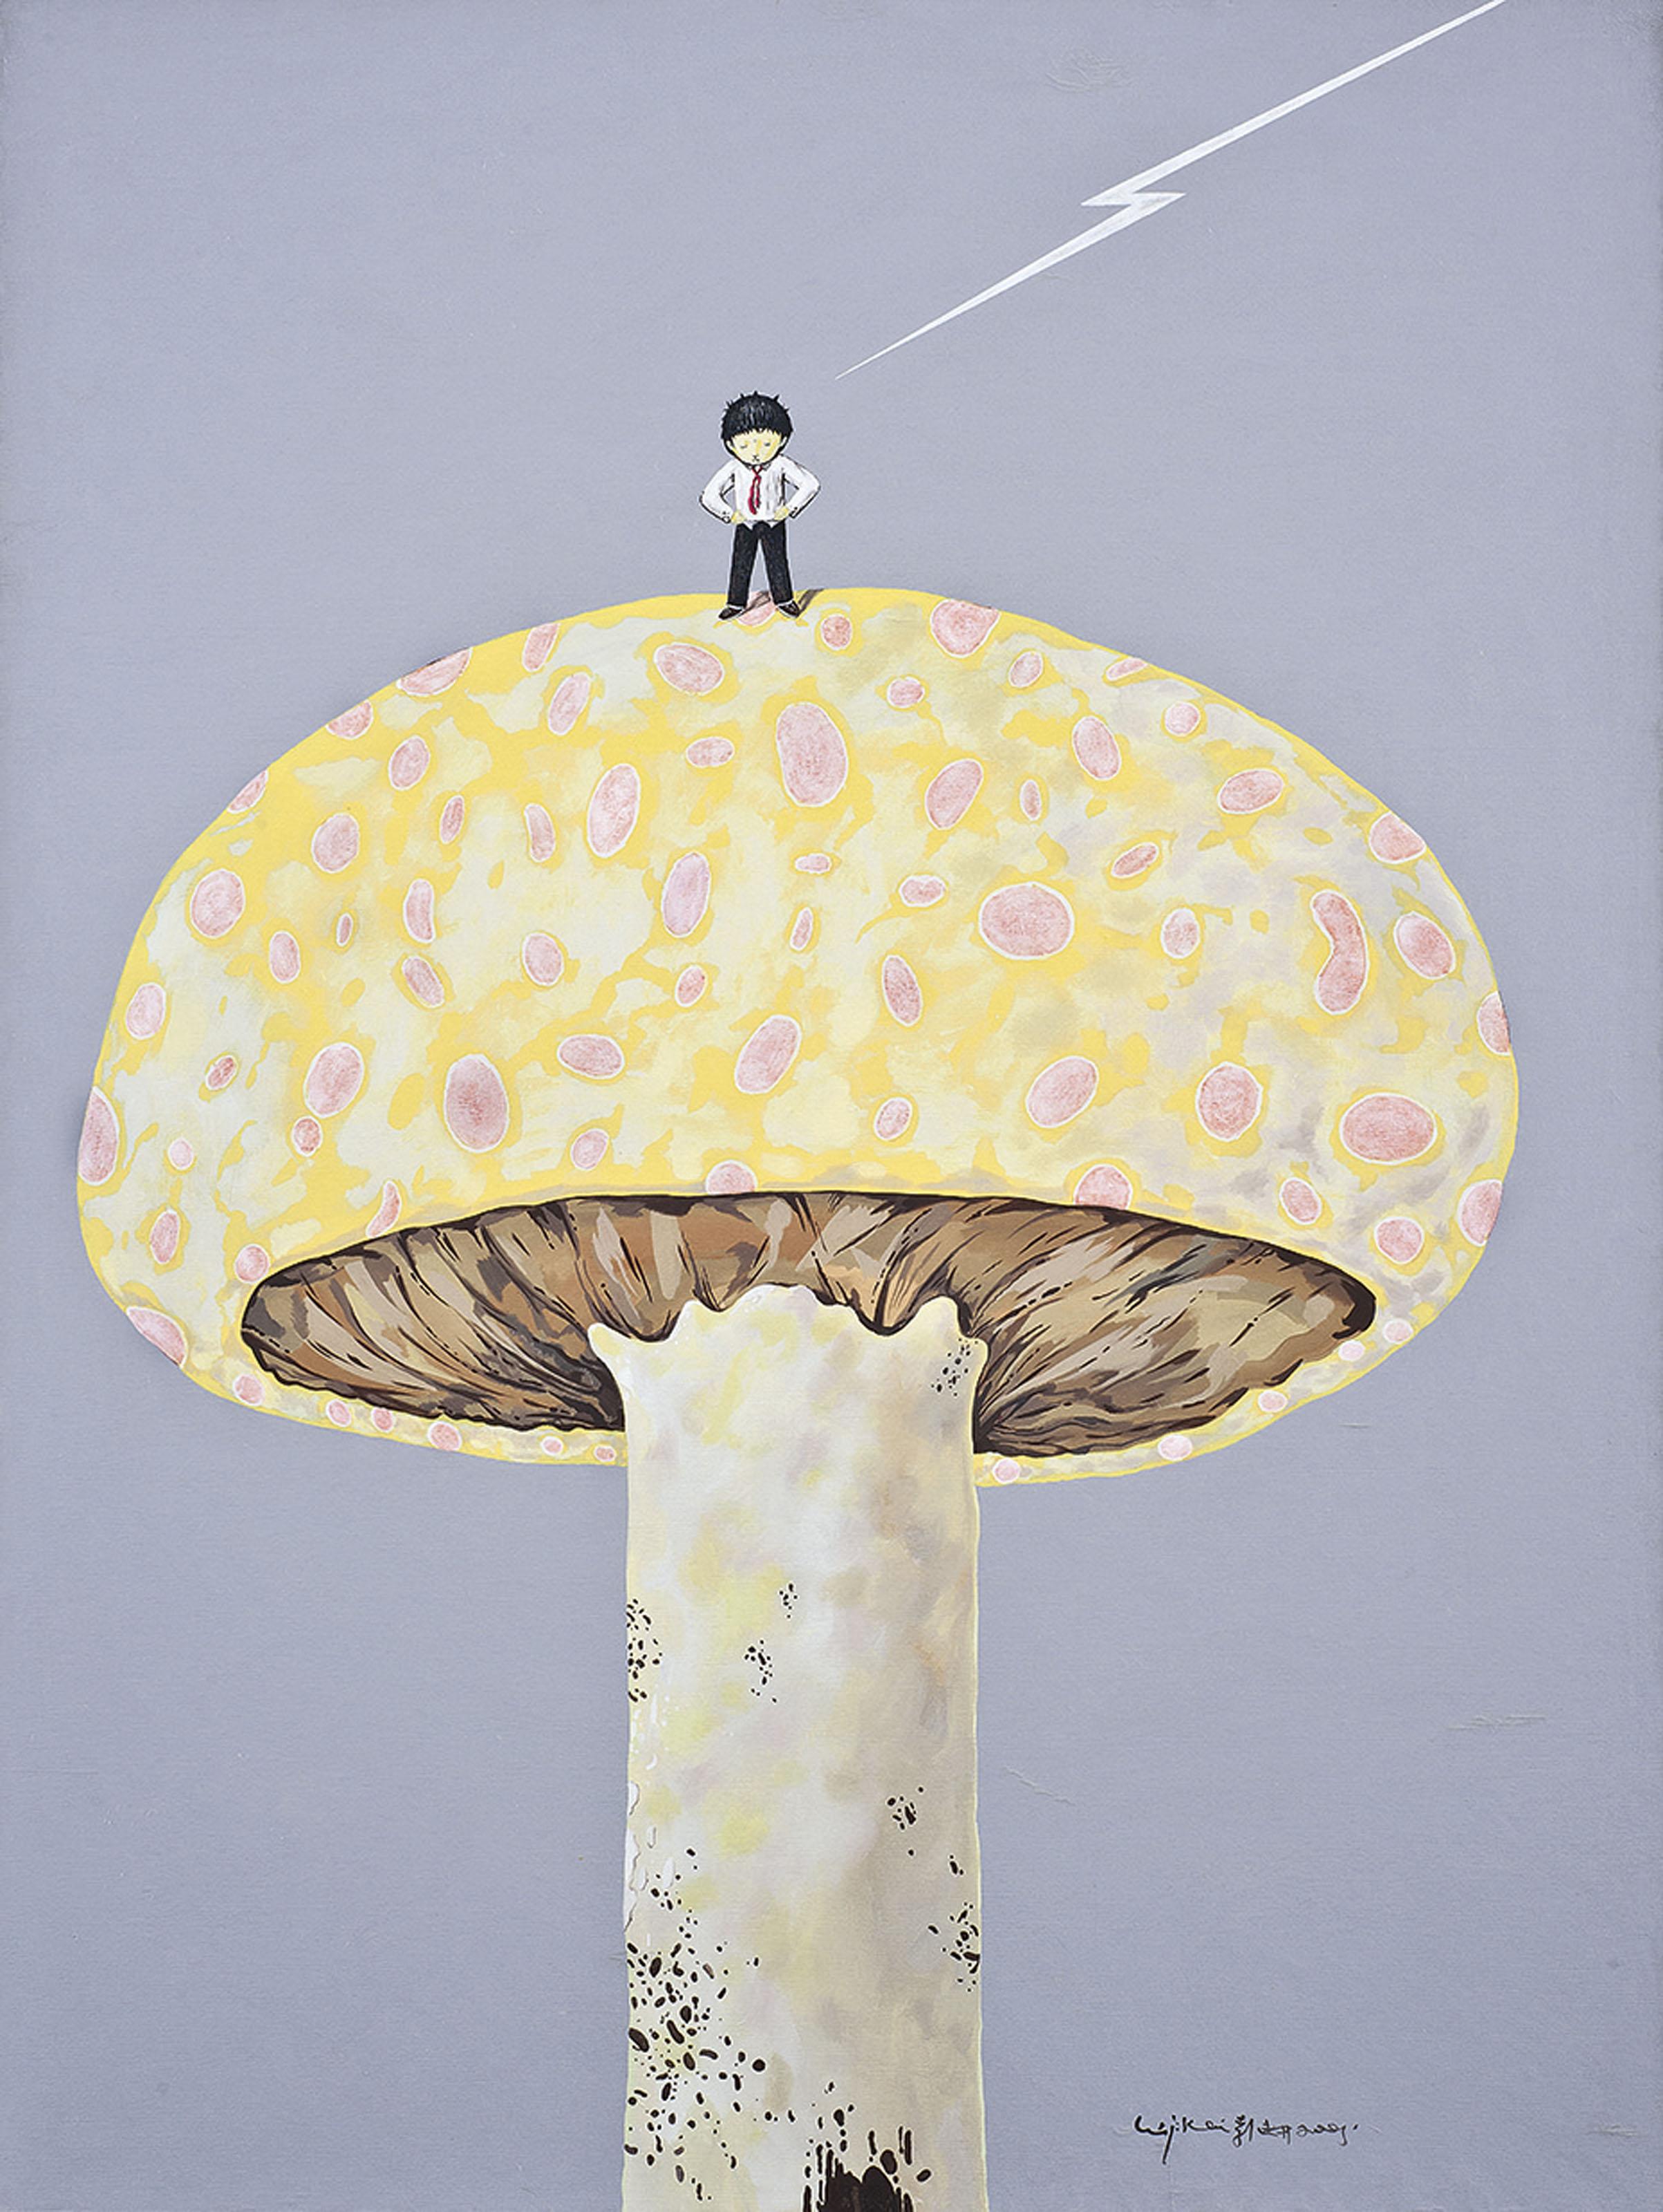 Boy and Mushroom